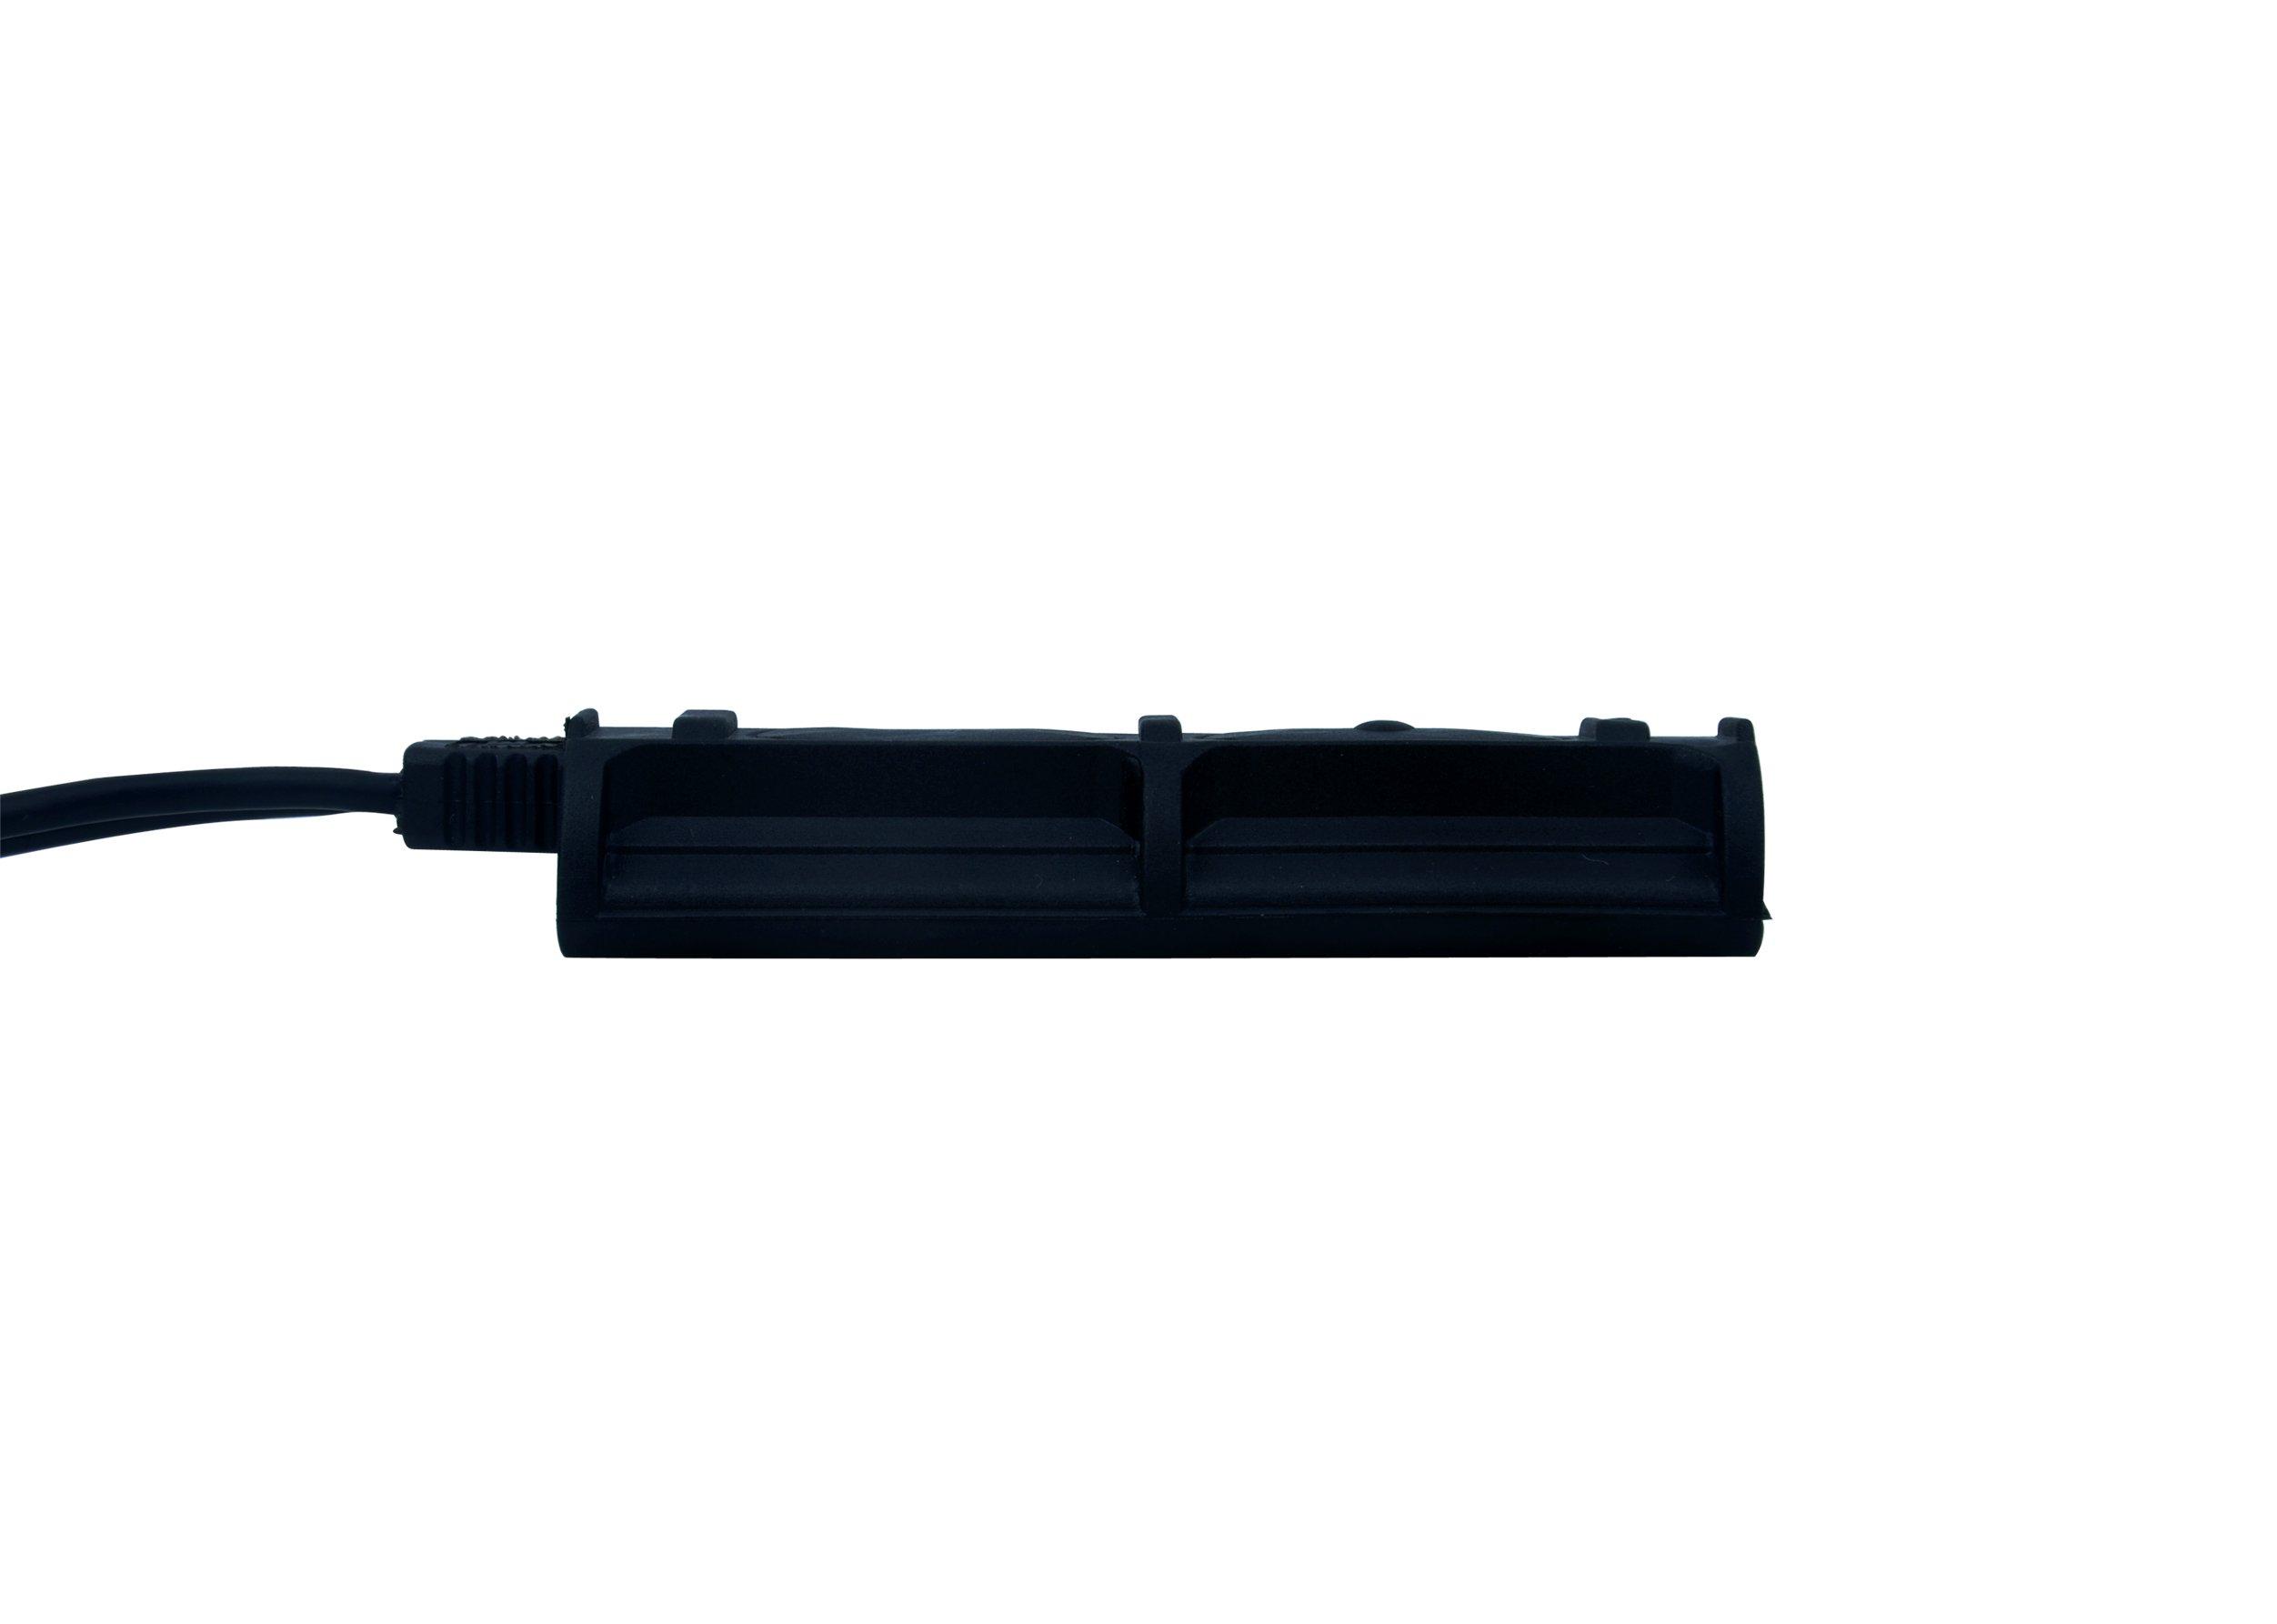 Night Evolution Remote Dual Pressure Switch for Weapon light and PEQ Gun Light NE07011-BK by Night evolution (Image #5)